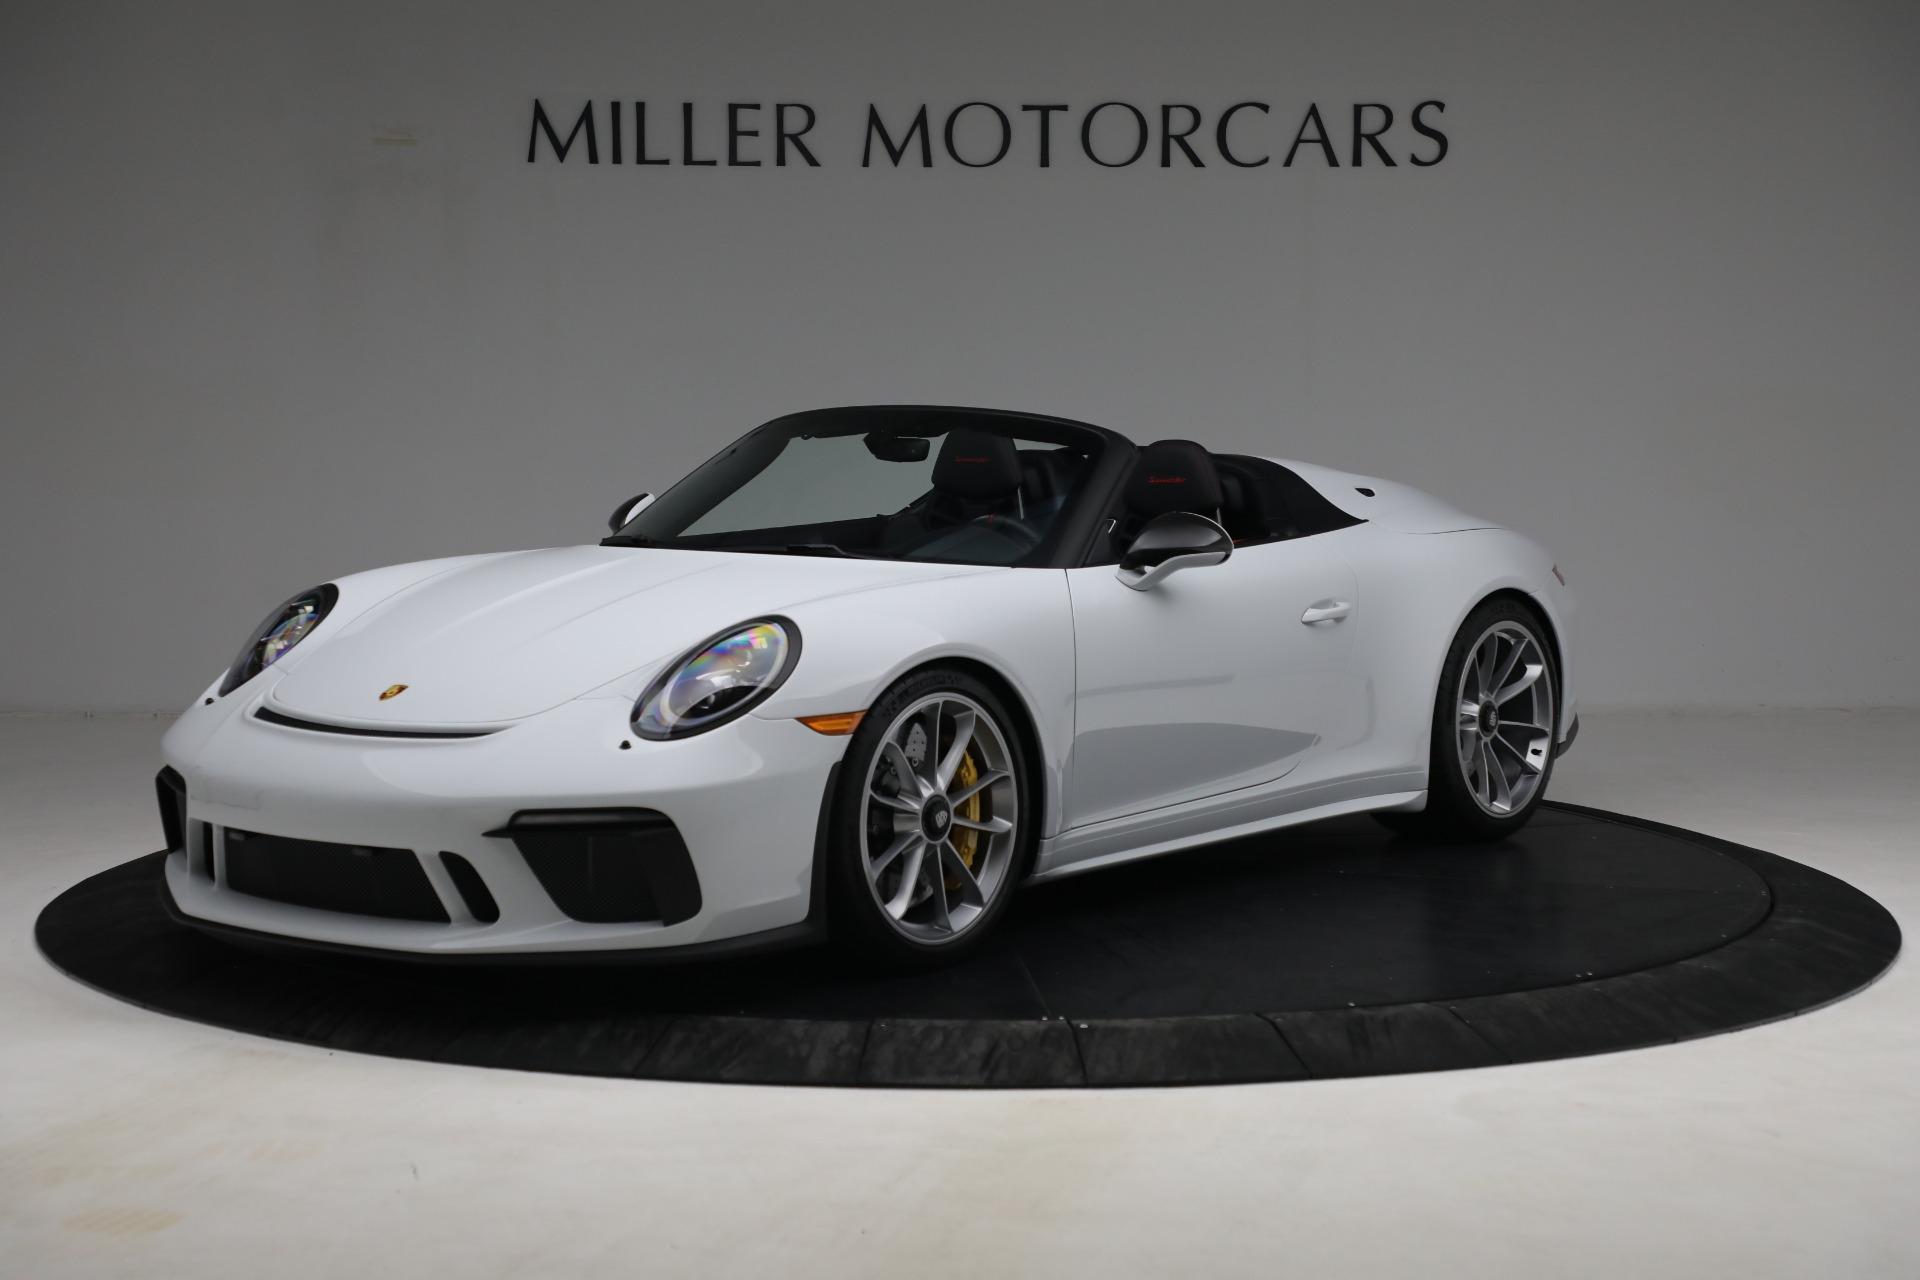 Used 2019 Porsche 911 Speedster for sale $395,900 at Bentley Greenwich in Greenwich CT 06830 1